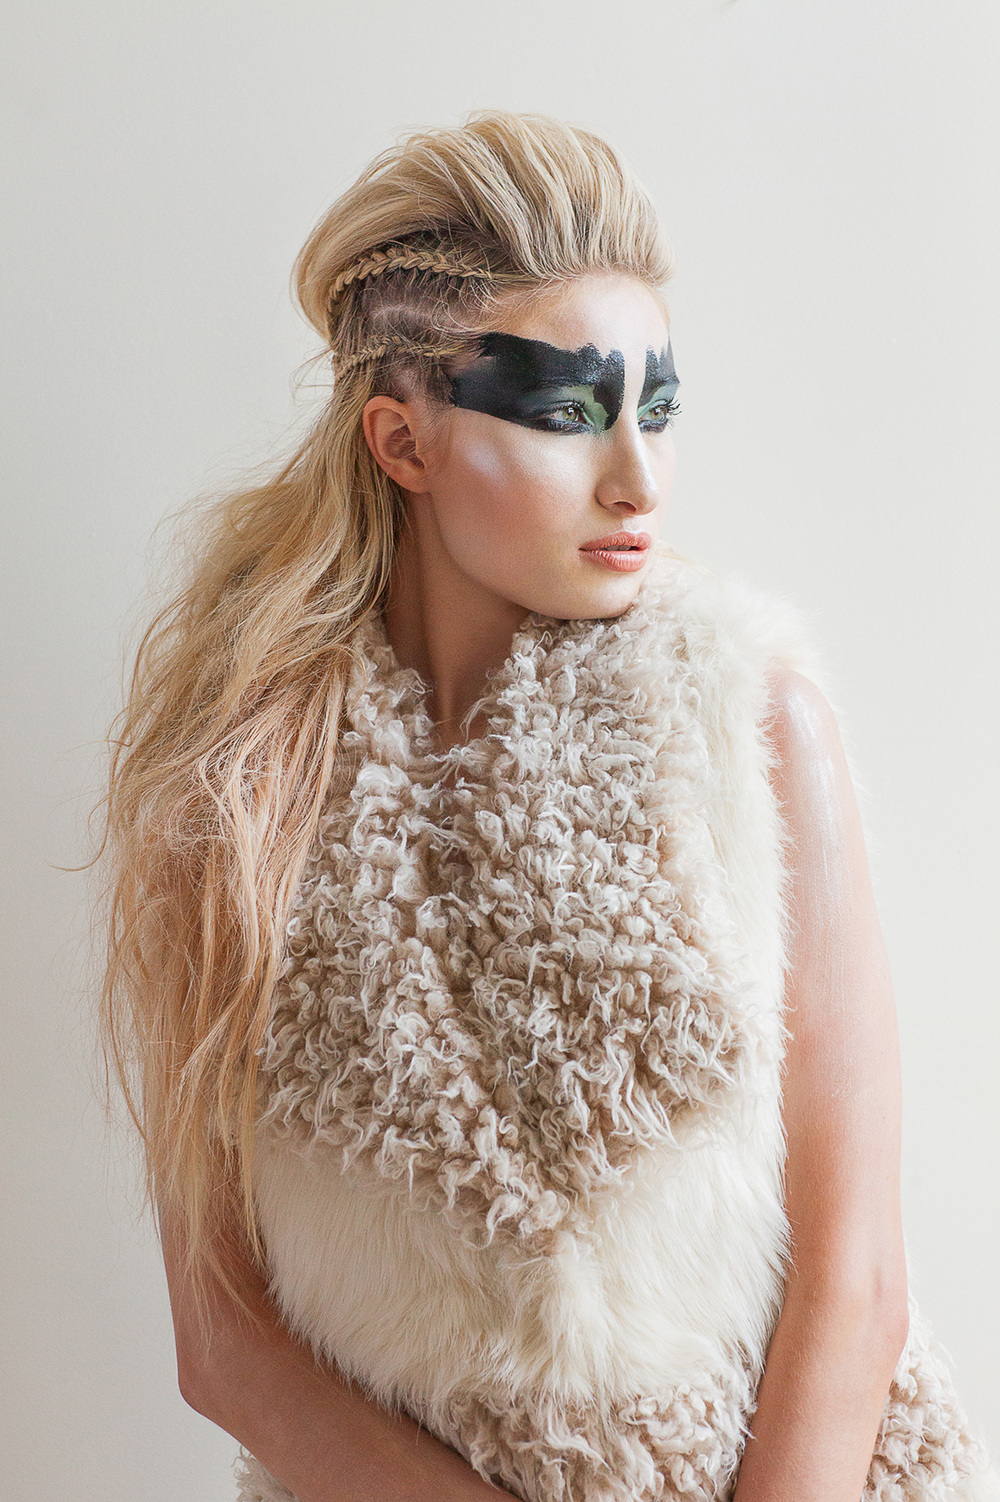 Makeup by Kacie Corbelle